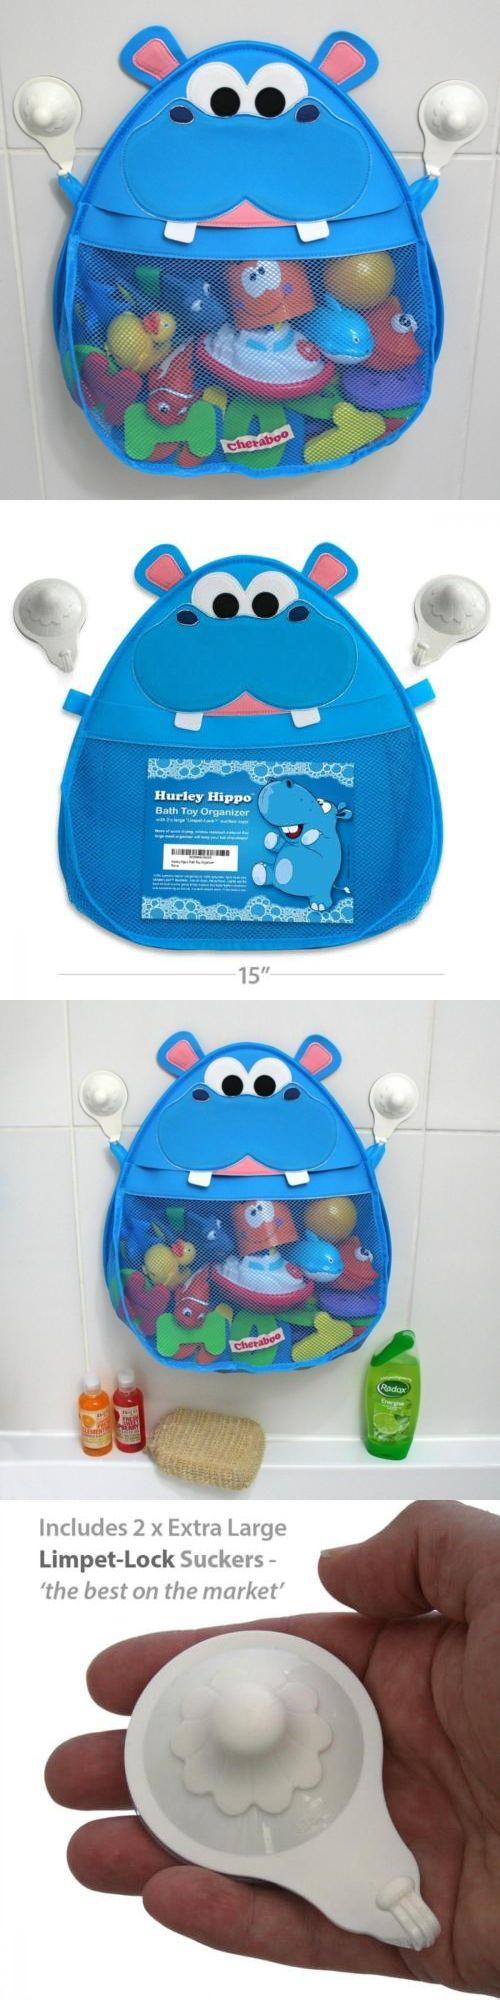 Bathing Accessories 100221: Hurley Hippo Bath Toy Organizer (Blue ...